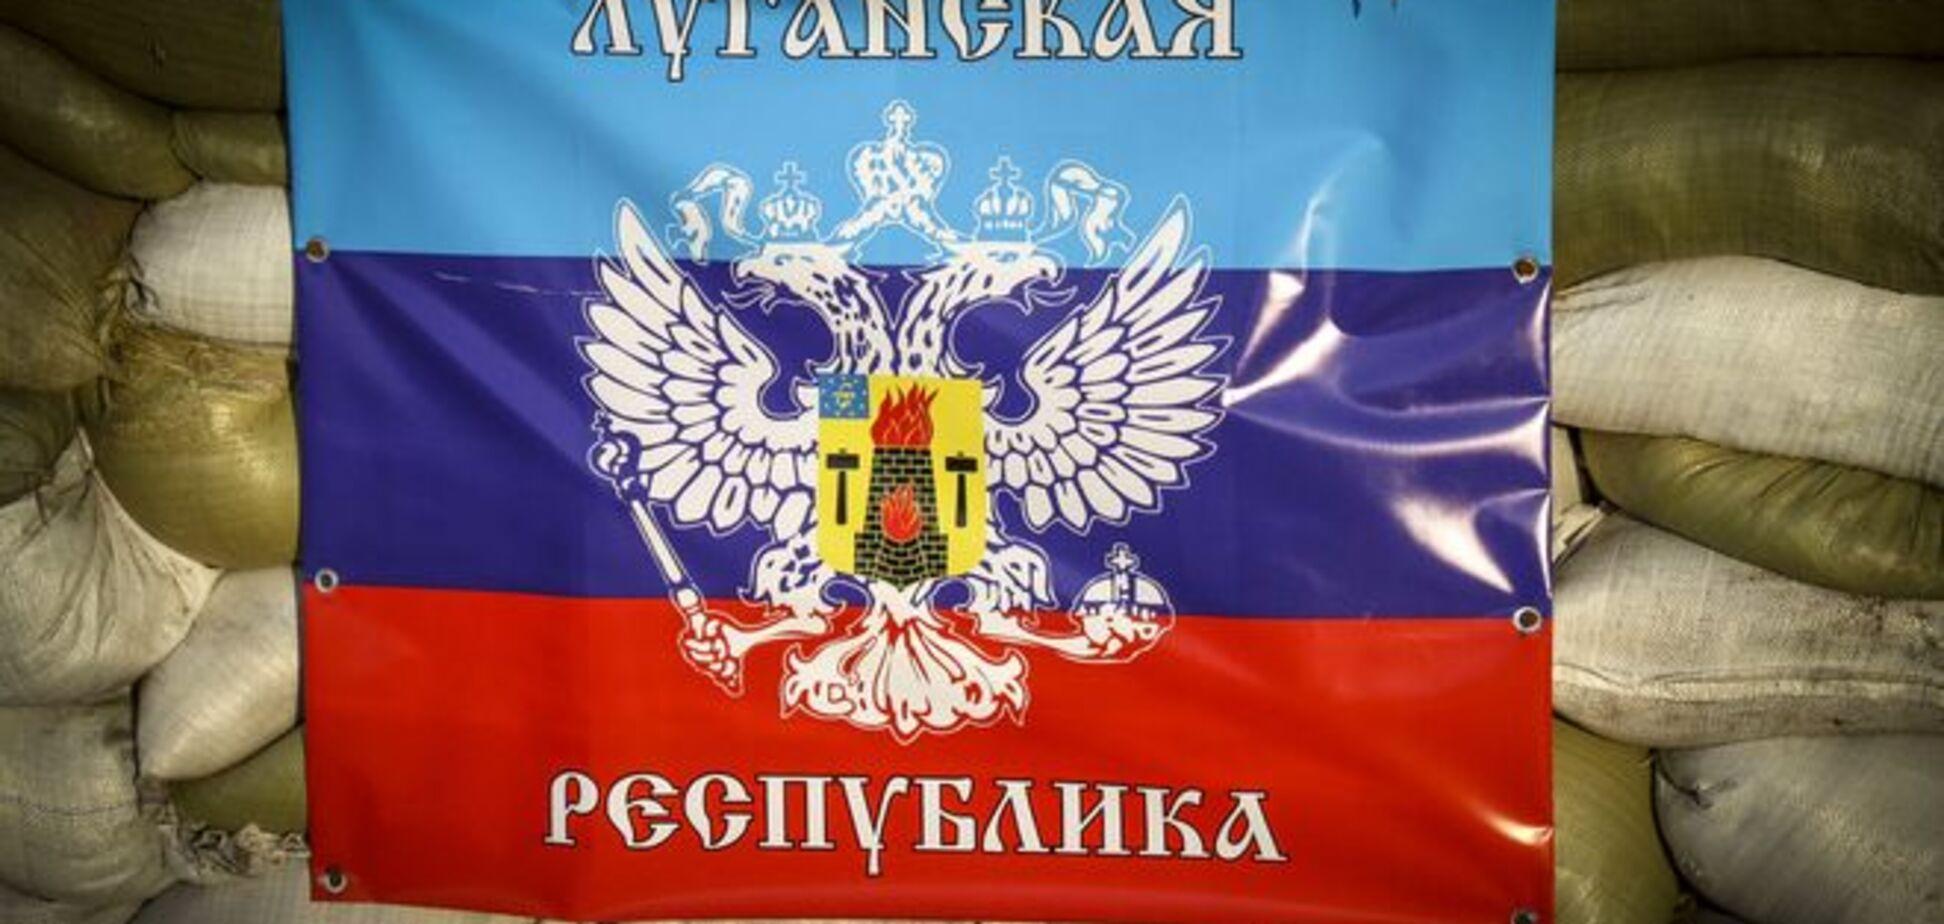 Террористы 'ЛНР' объявили шахтерам ультиматум